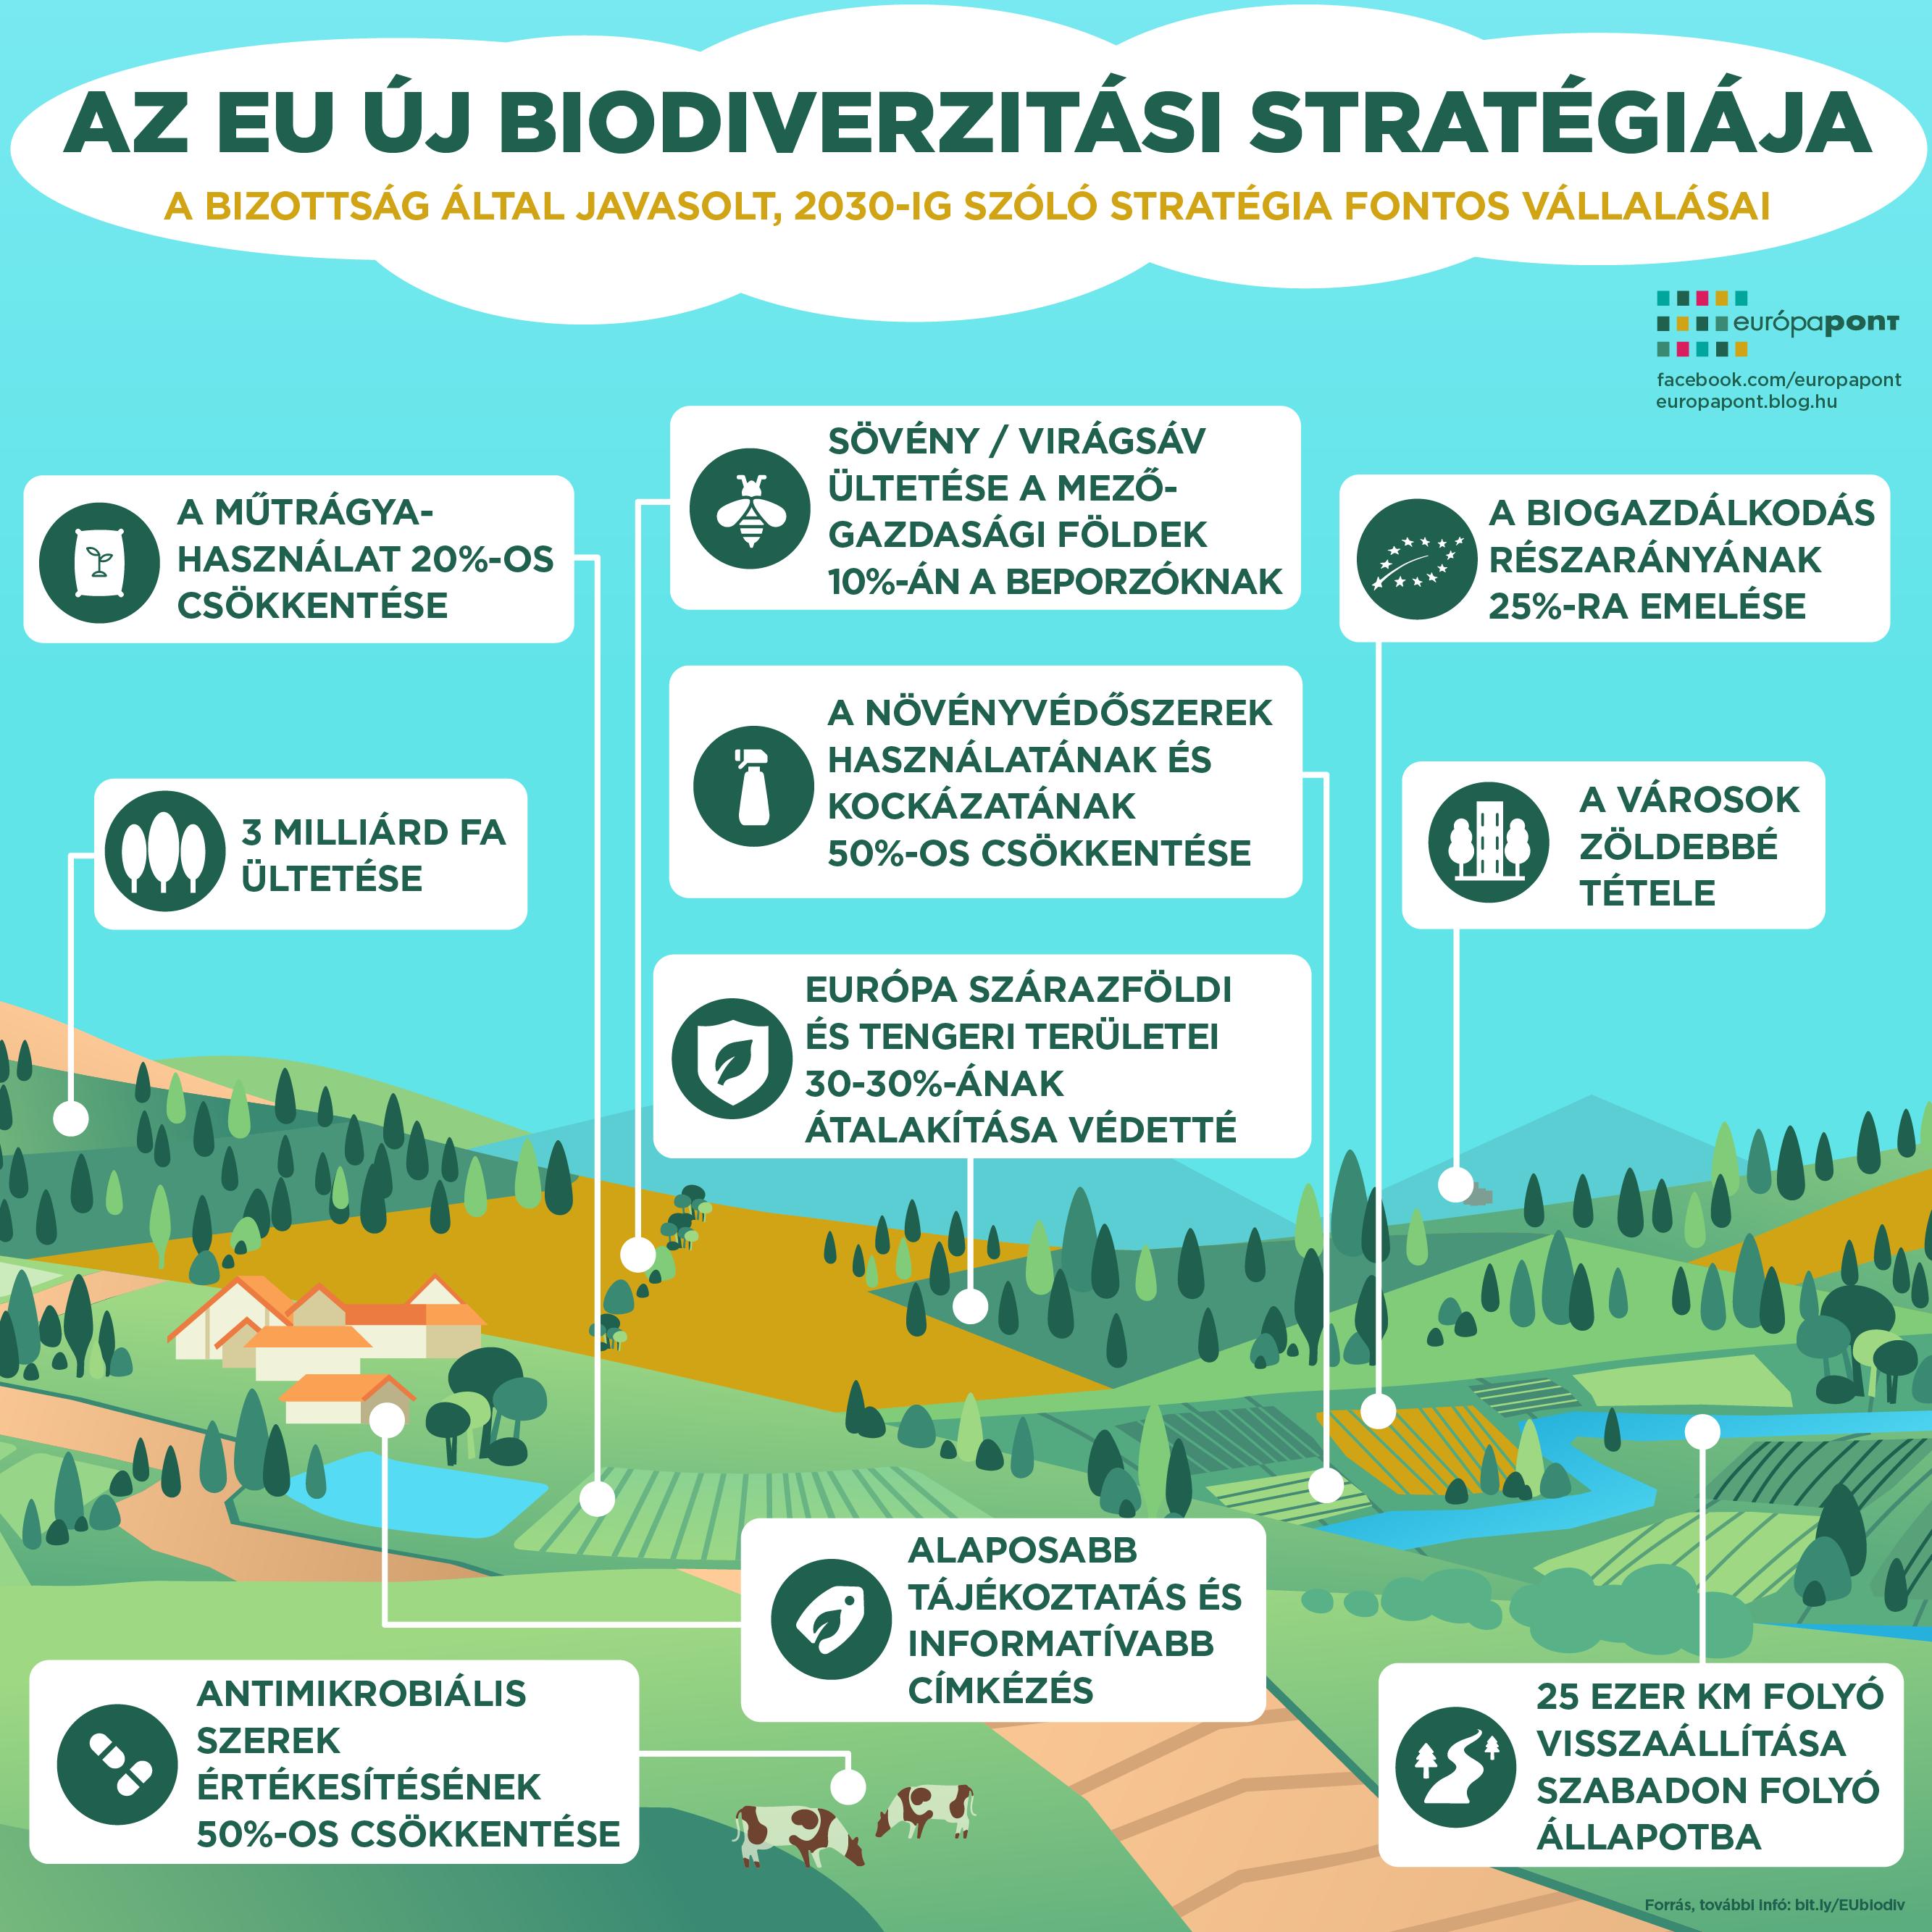 biodiverzitas4-01.png